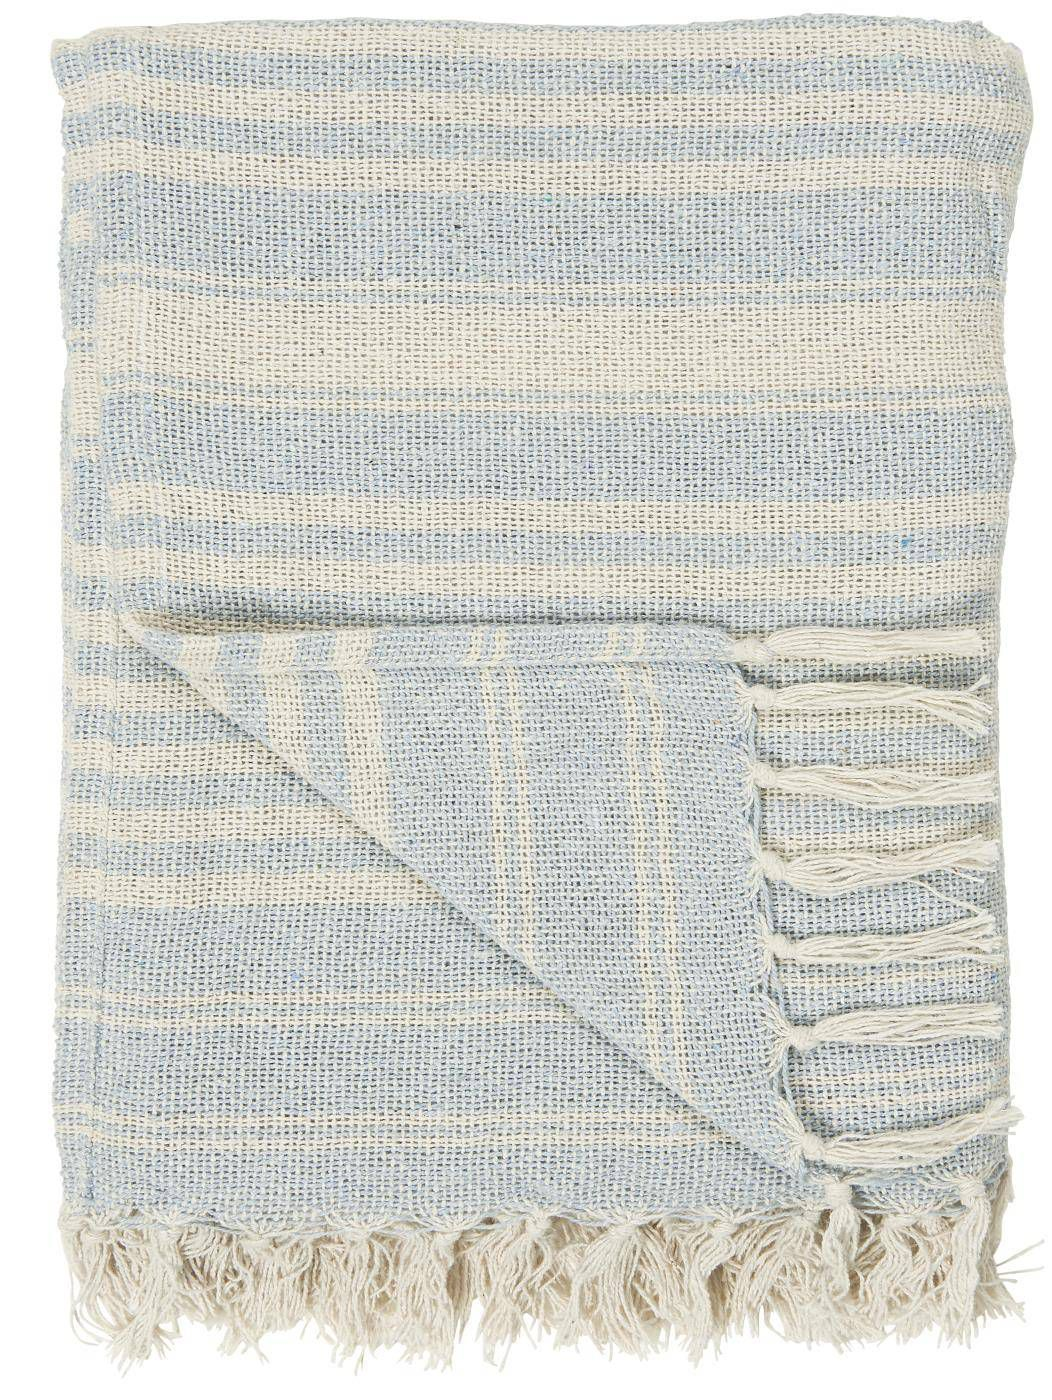 IB LAURSEN Bavlněný přehoz Cream Light Blue Stripe 130 × 160 cm